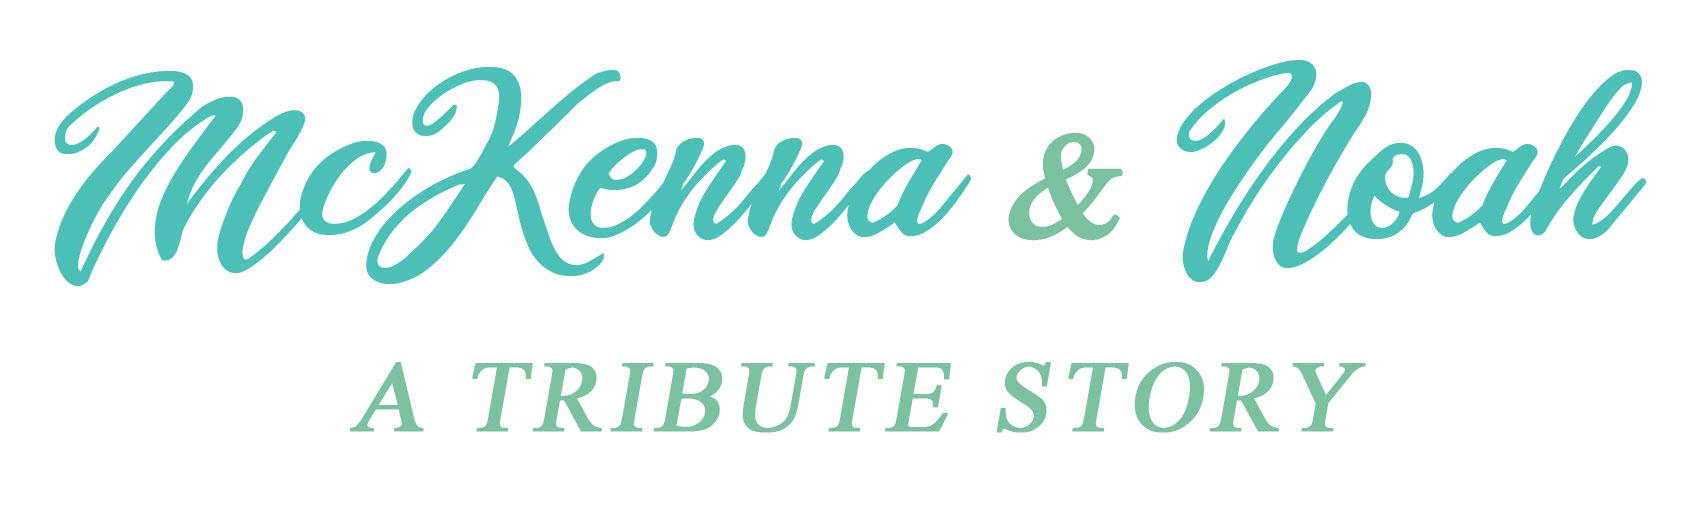 Noah & McKenna - A Tribute Story